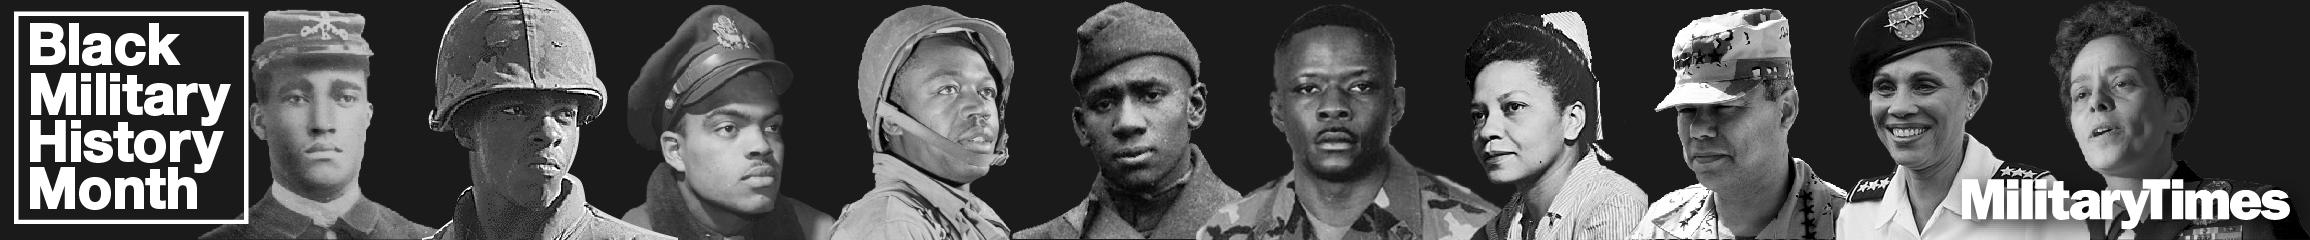 Black Military History